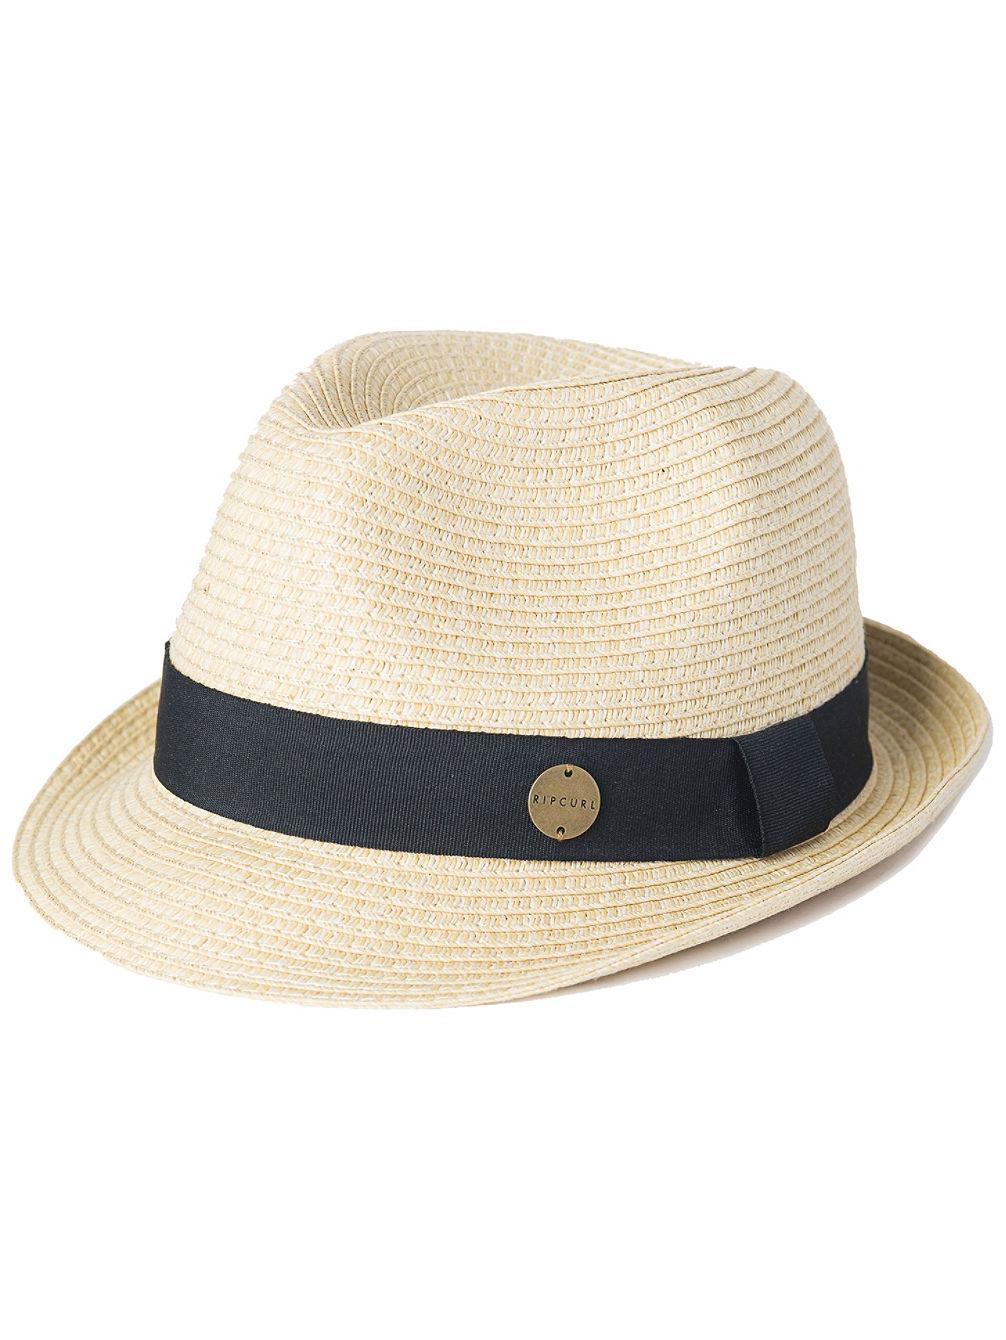 6262de73382 Buy Rip Curl Dakota Fedora Hat online at blue-tomato.com